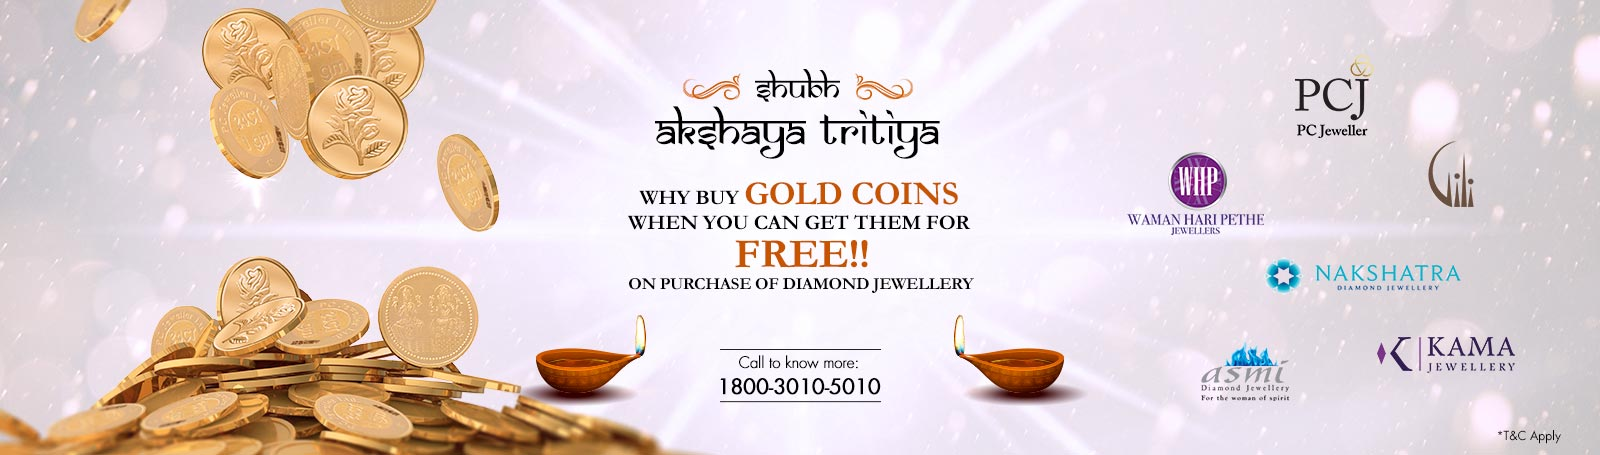 WearYourShine - Akshaya Tritiya